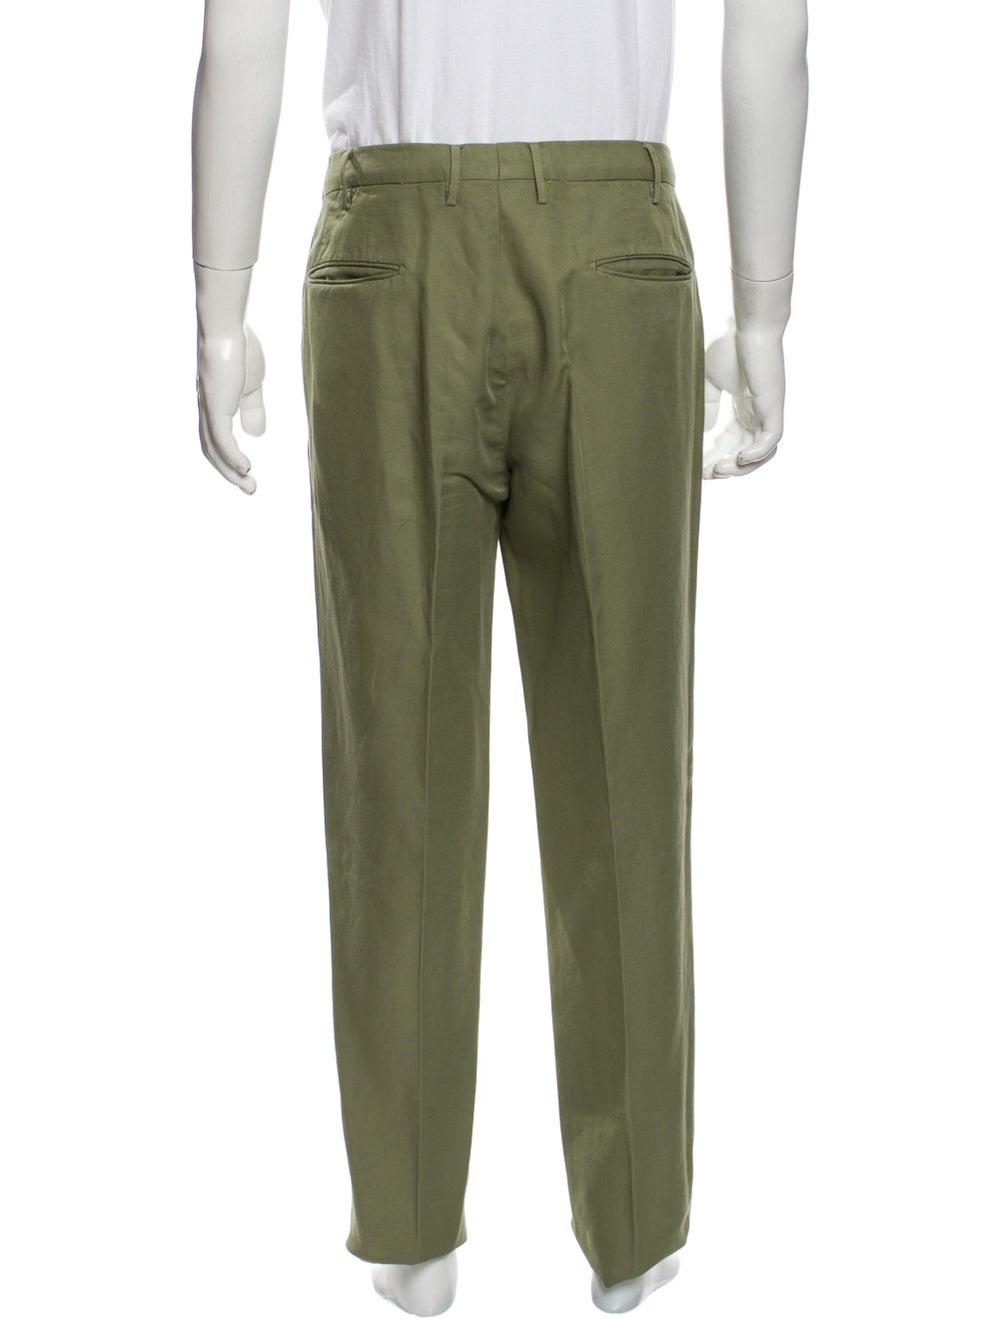 Incotex Pants Green - image 3